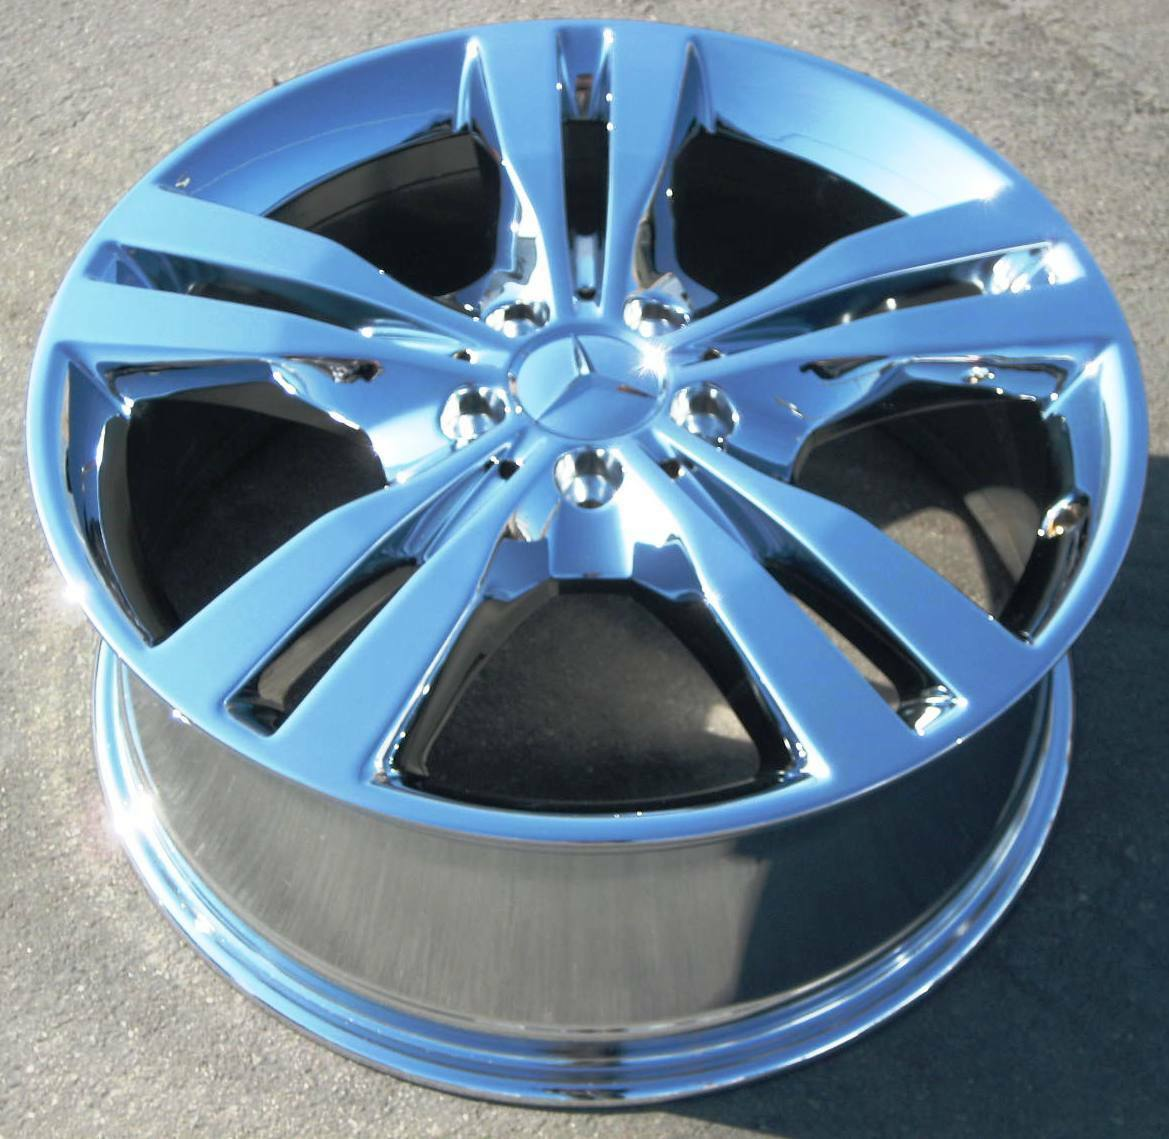 "4 New 19"" Factory Mercedes ML550 ML350 GL450 GL350 R350 G550 Chrome Wheels Rims"